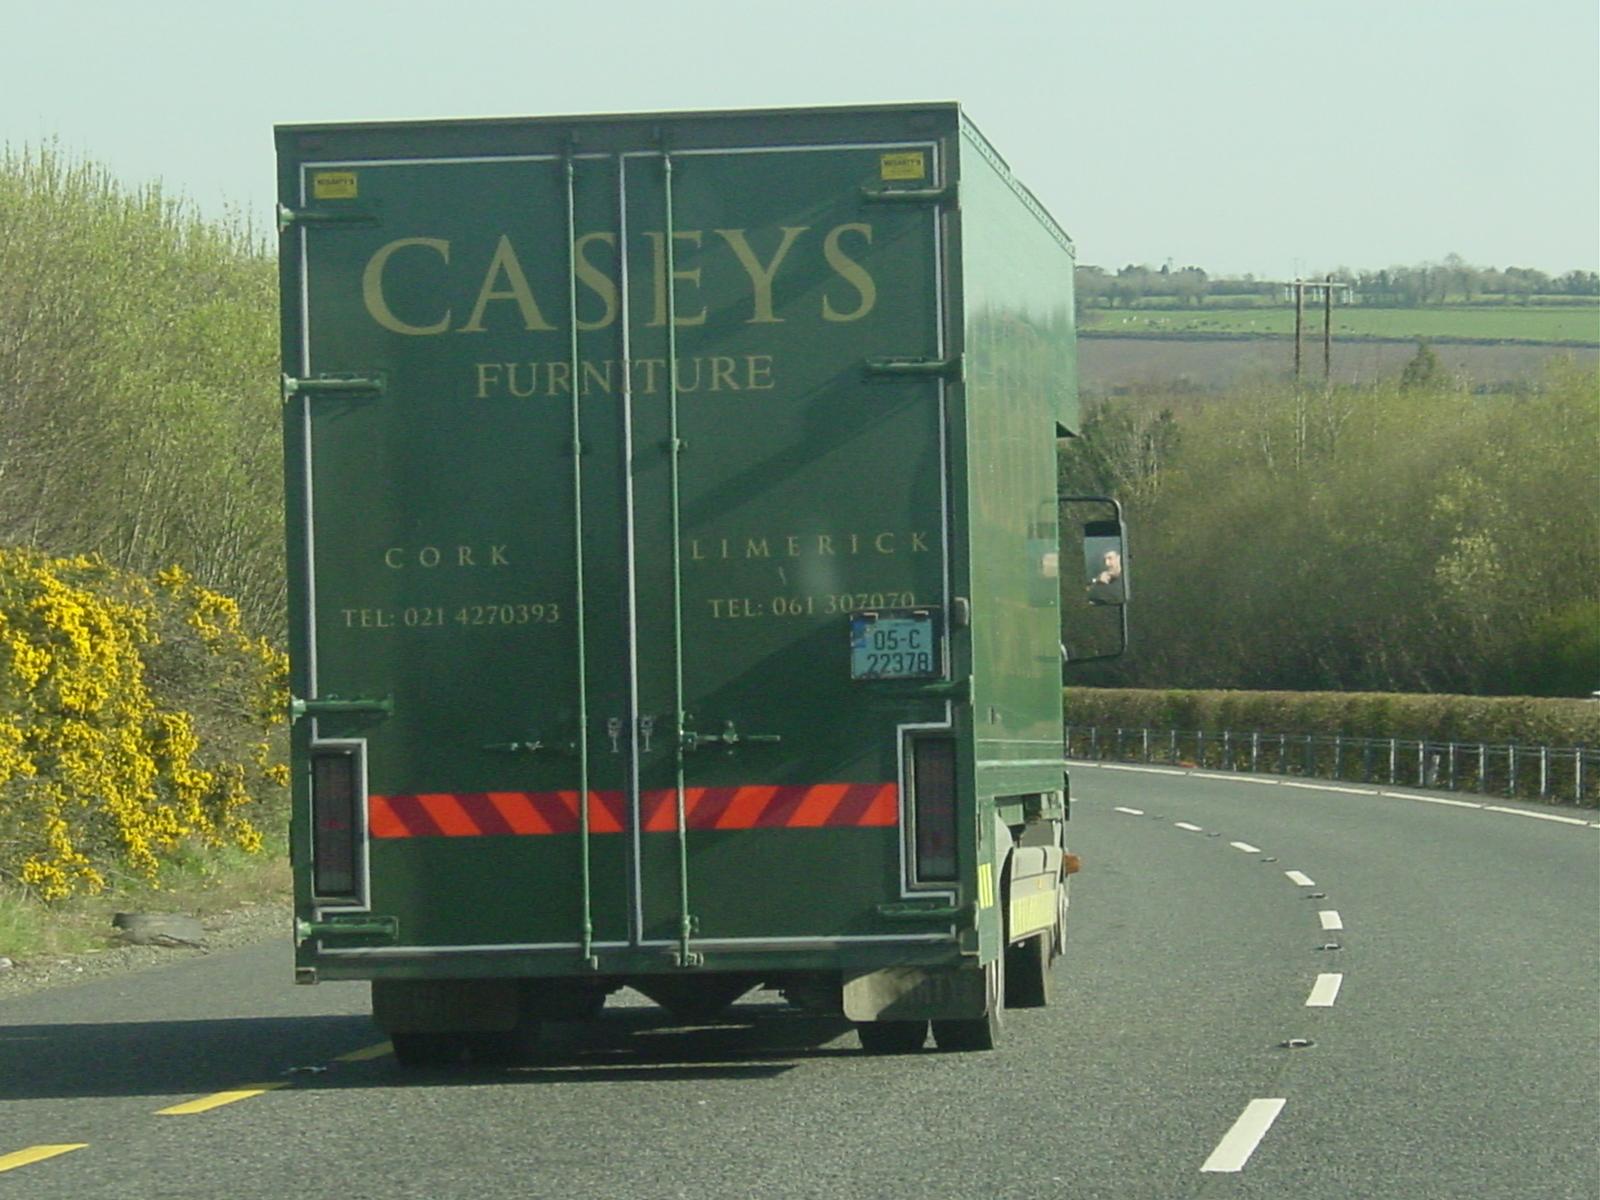 Caseyu0027s Furniture Caseyu0027s Furniture | Flickr   Photo Sharing!